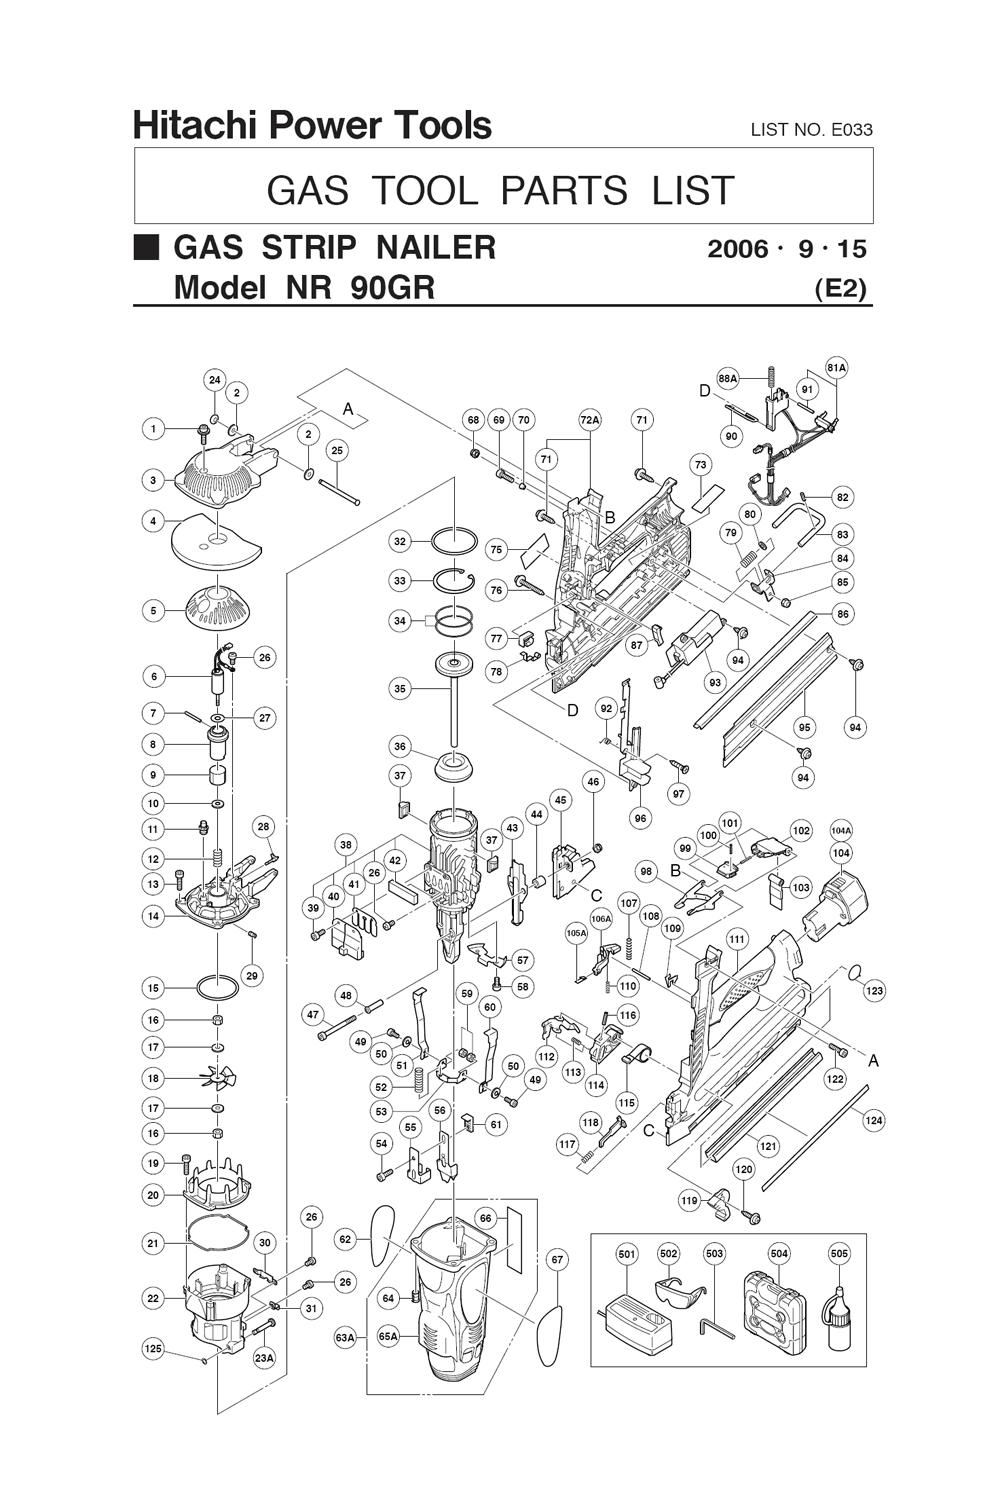 1970 chevy c10 wiring diagram alternator hitachi c10 wiring diagram